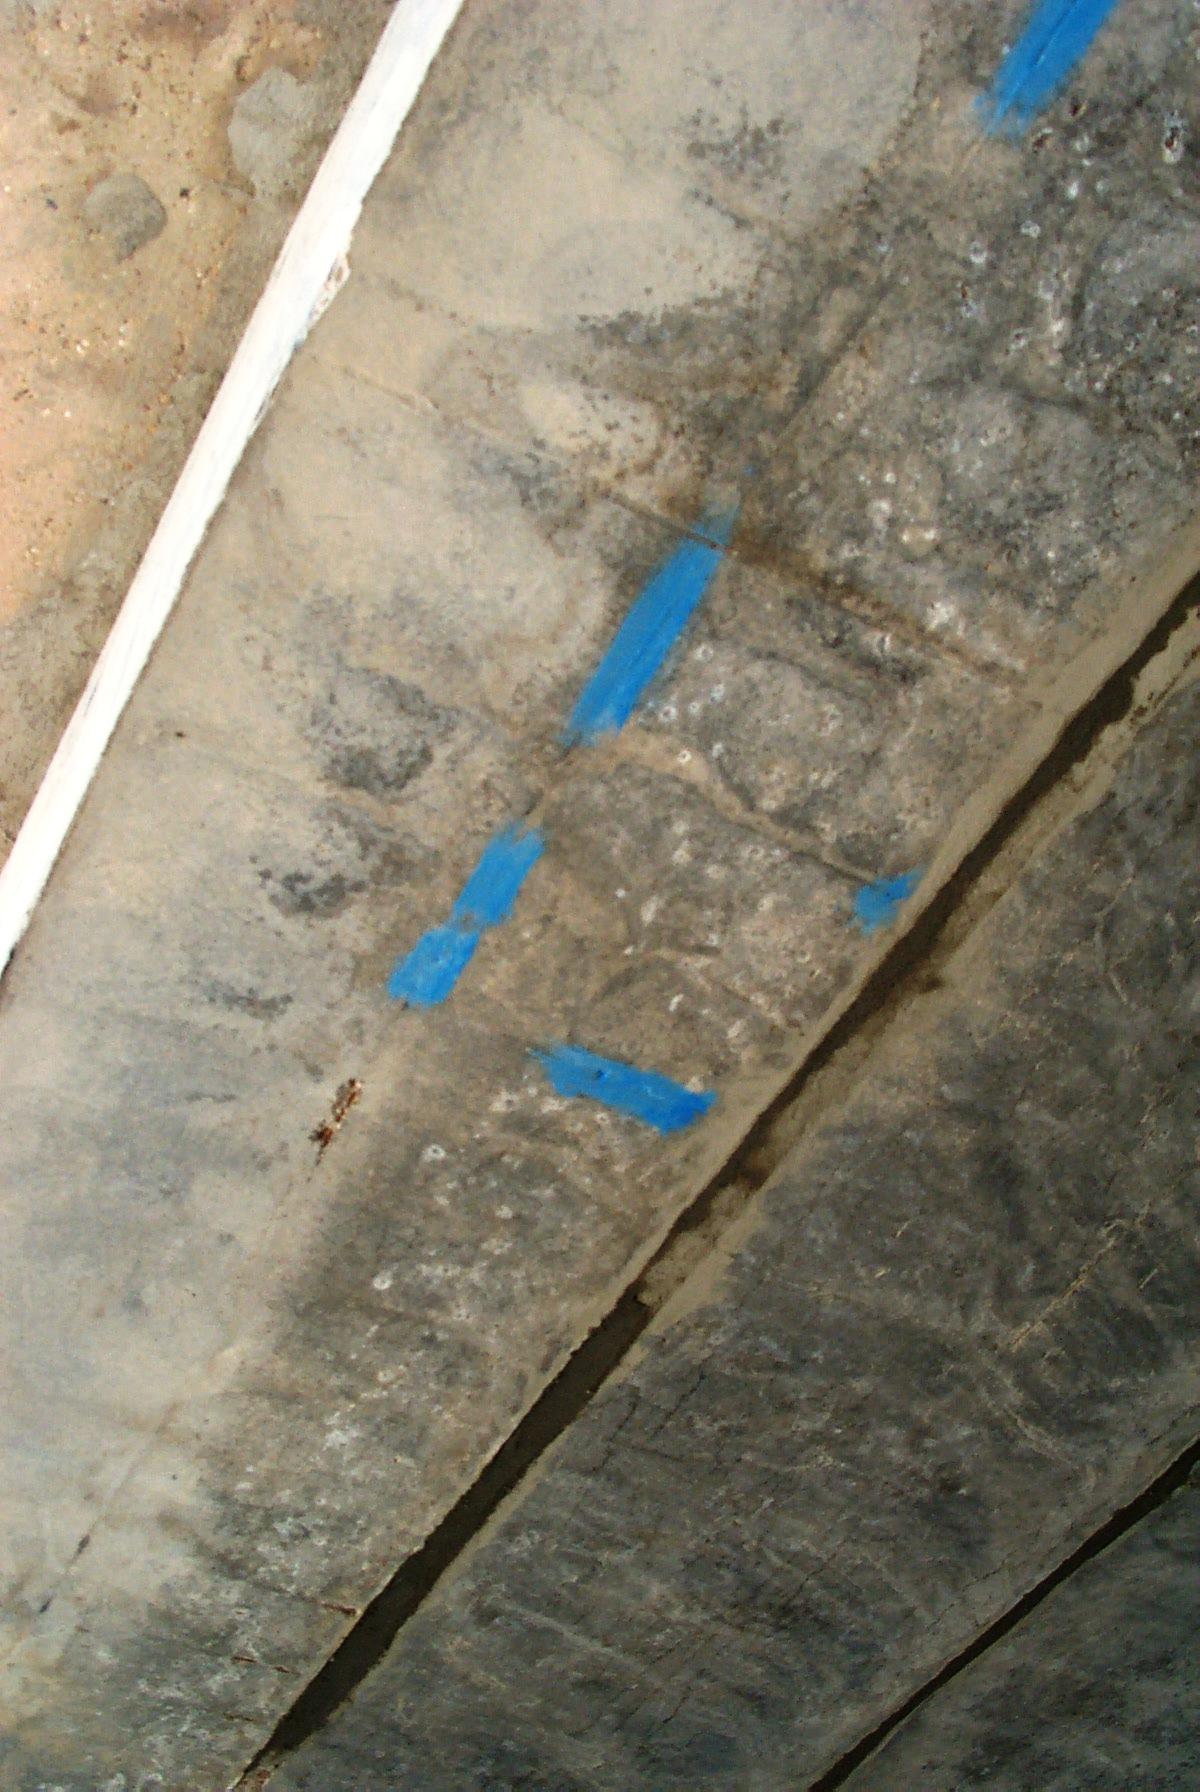 Reparatii pod (DN2), Km. 33 - 028, peste raul Calnistea MAPEI - Poza 8